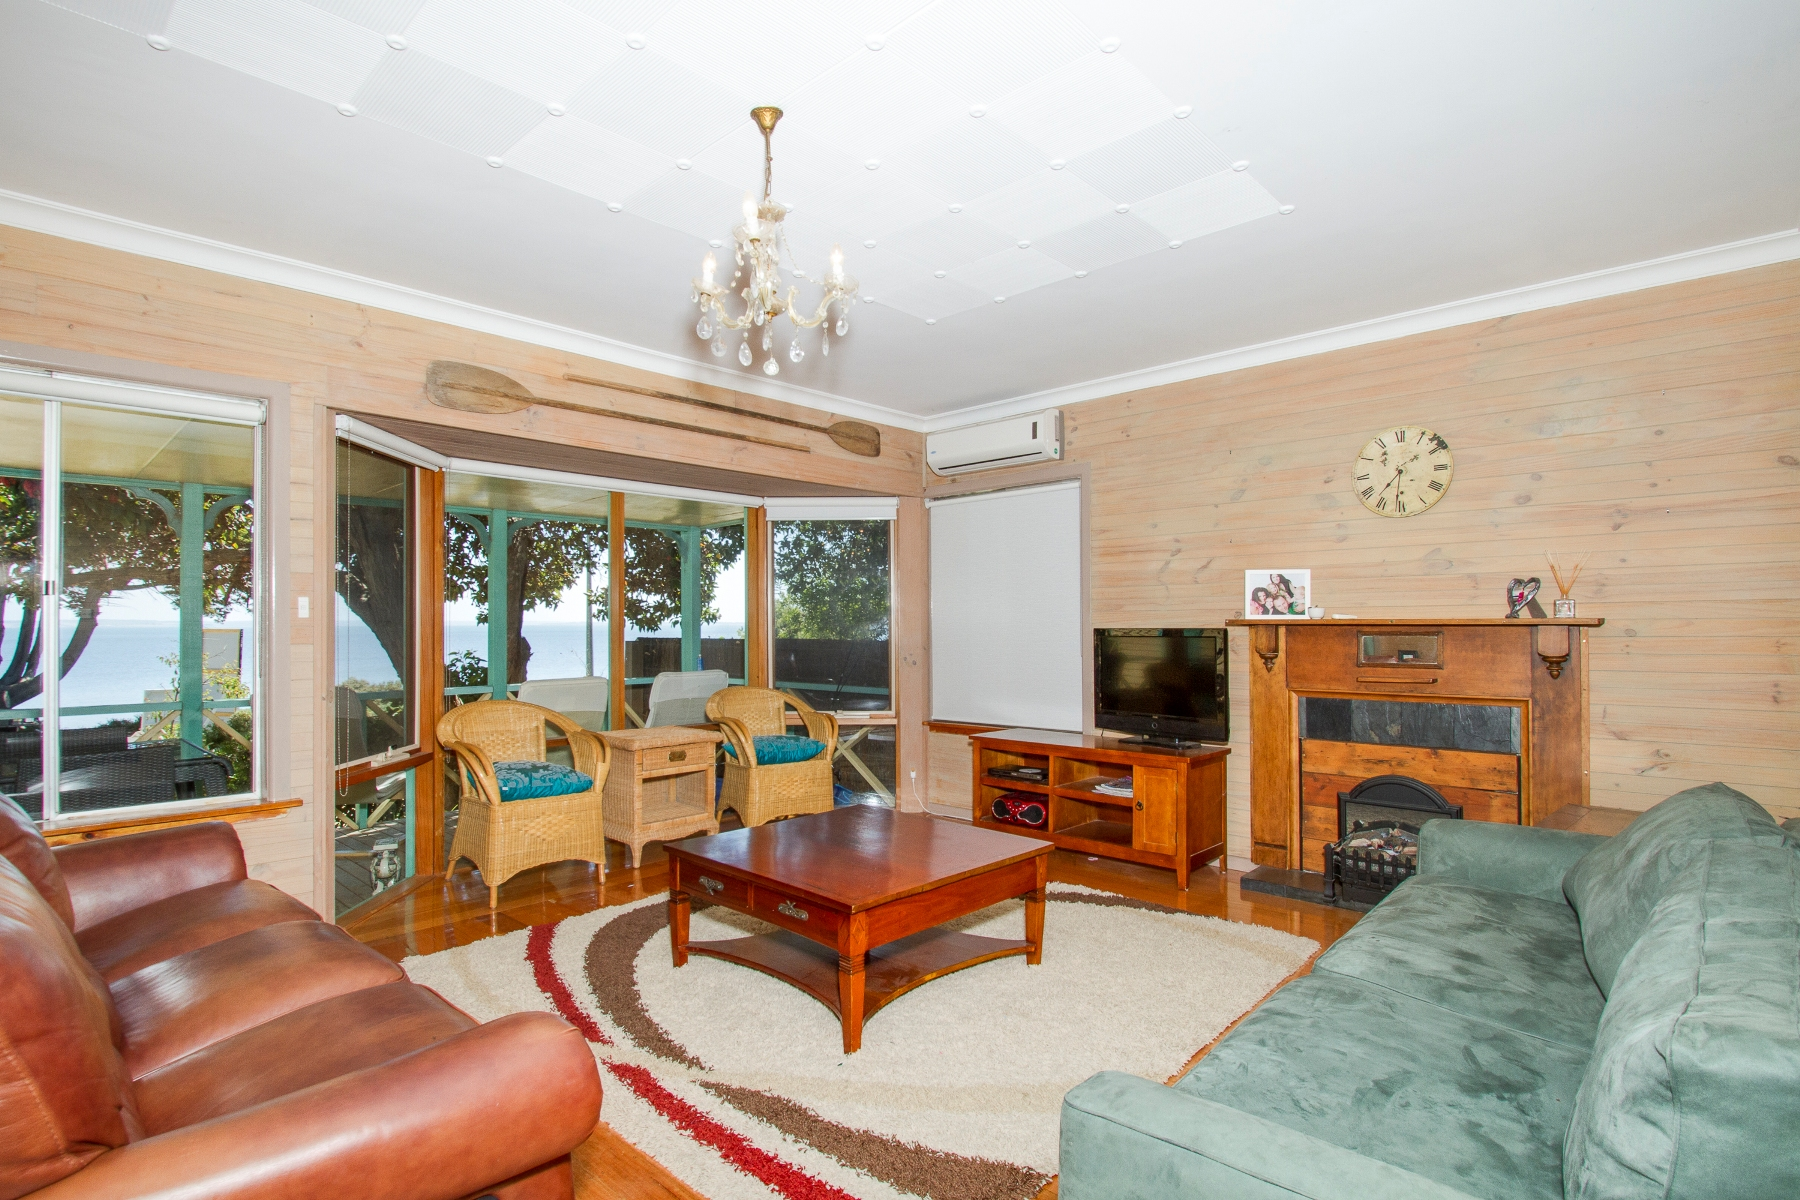 Newhaven Australia  city images : ... Cottage Apartments Hotel Newhaven, Australia : Prezzi e recensioni